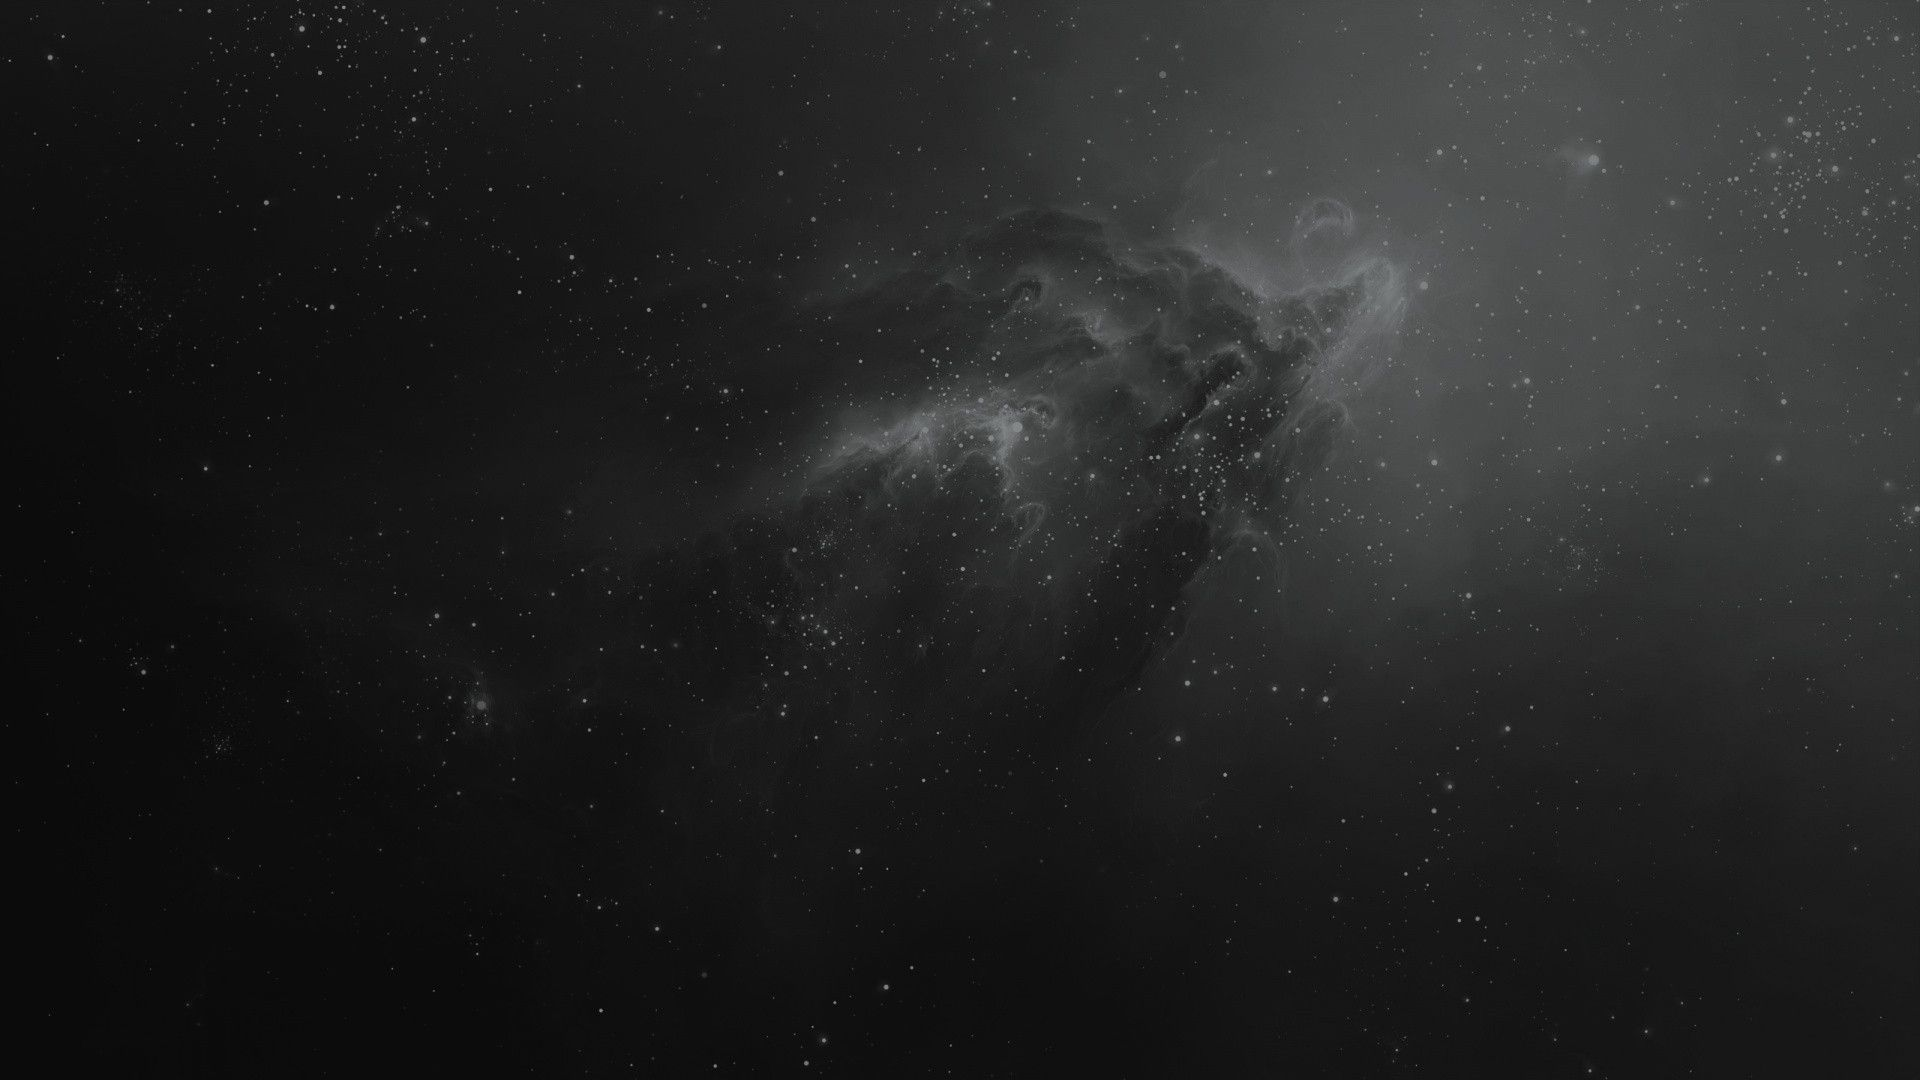 Dark Space Wallpaper Computer Wallpaper Desktop Wallpapers Galaxy Wallpaper Wallpaper